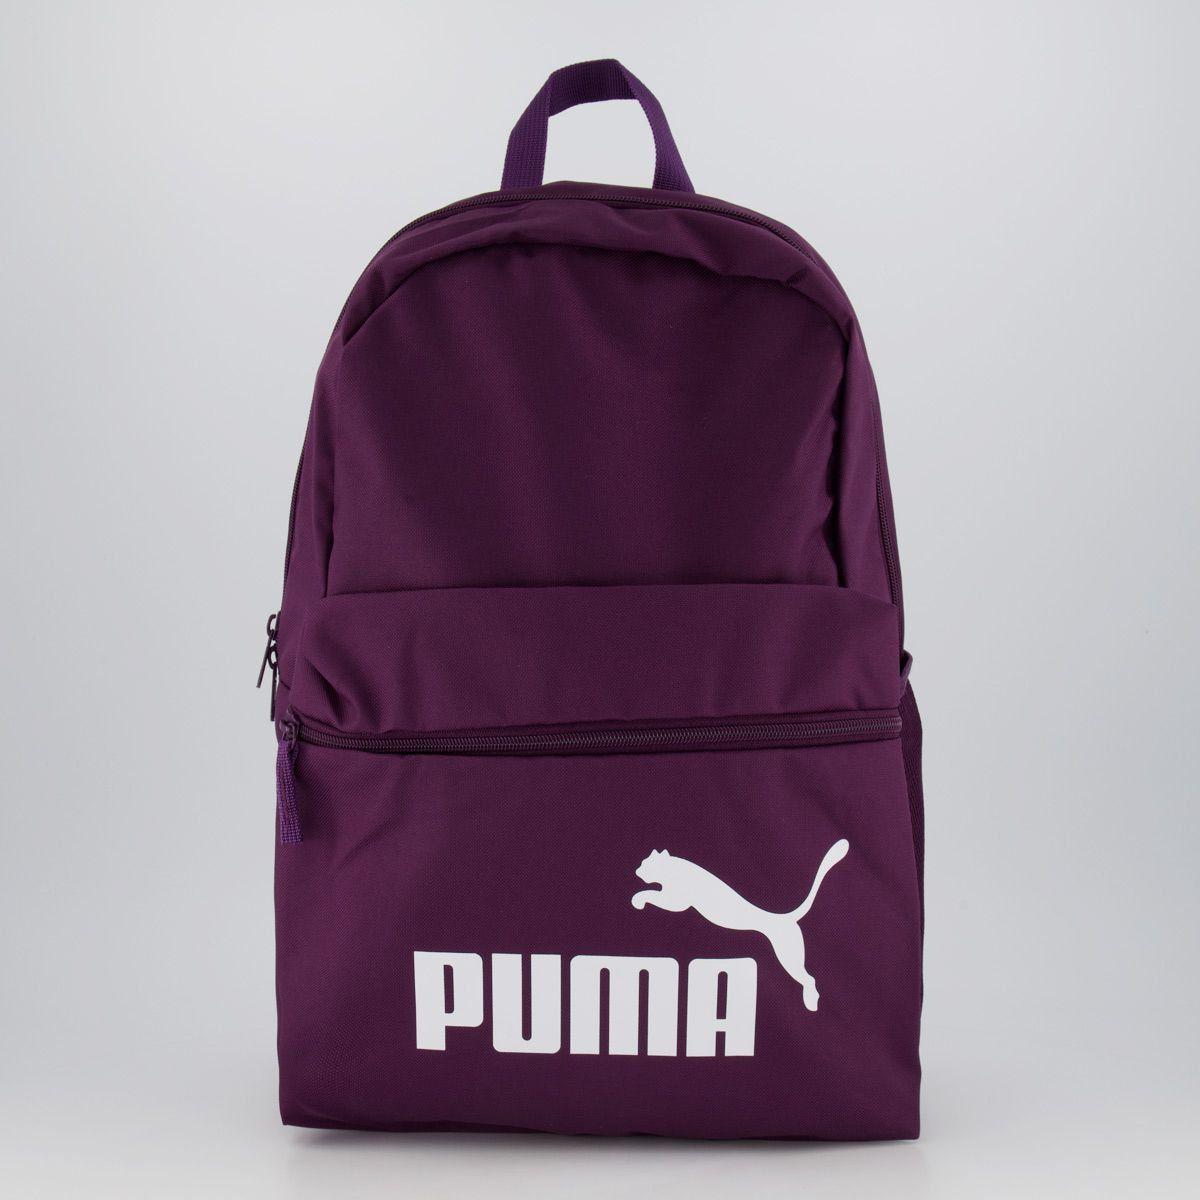 MOCHILA PUMA 75487 - VIN